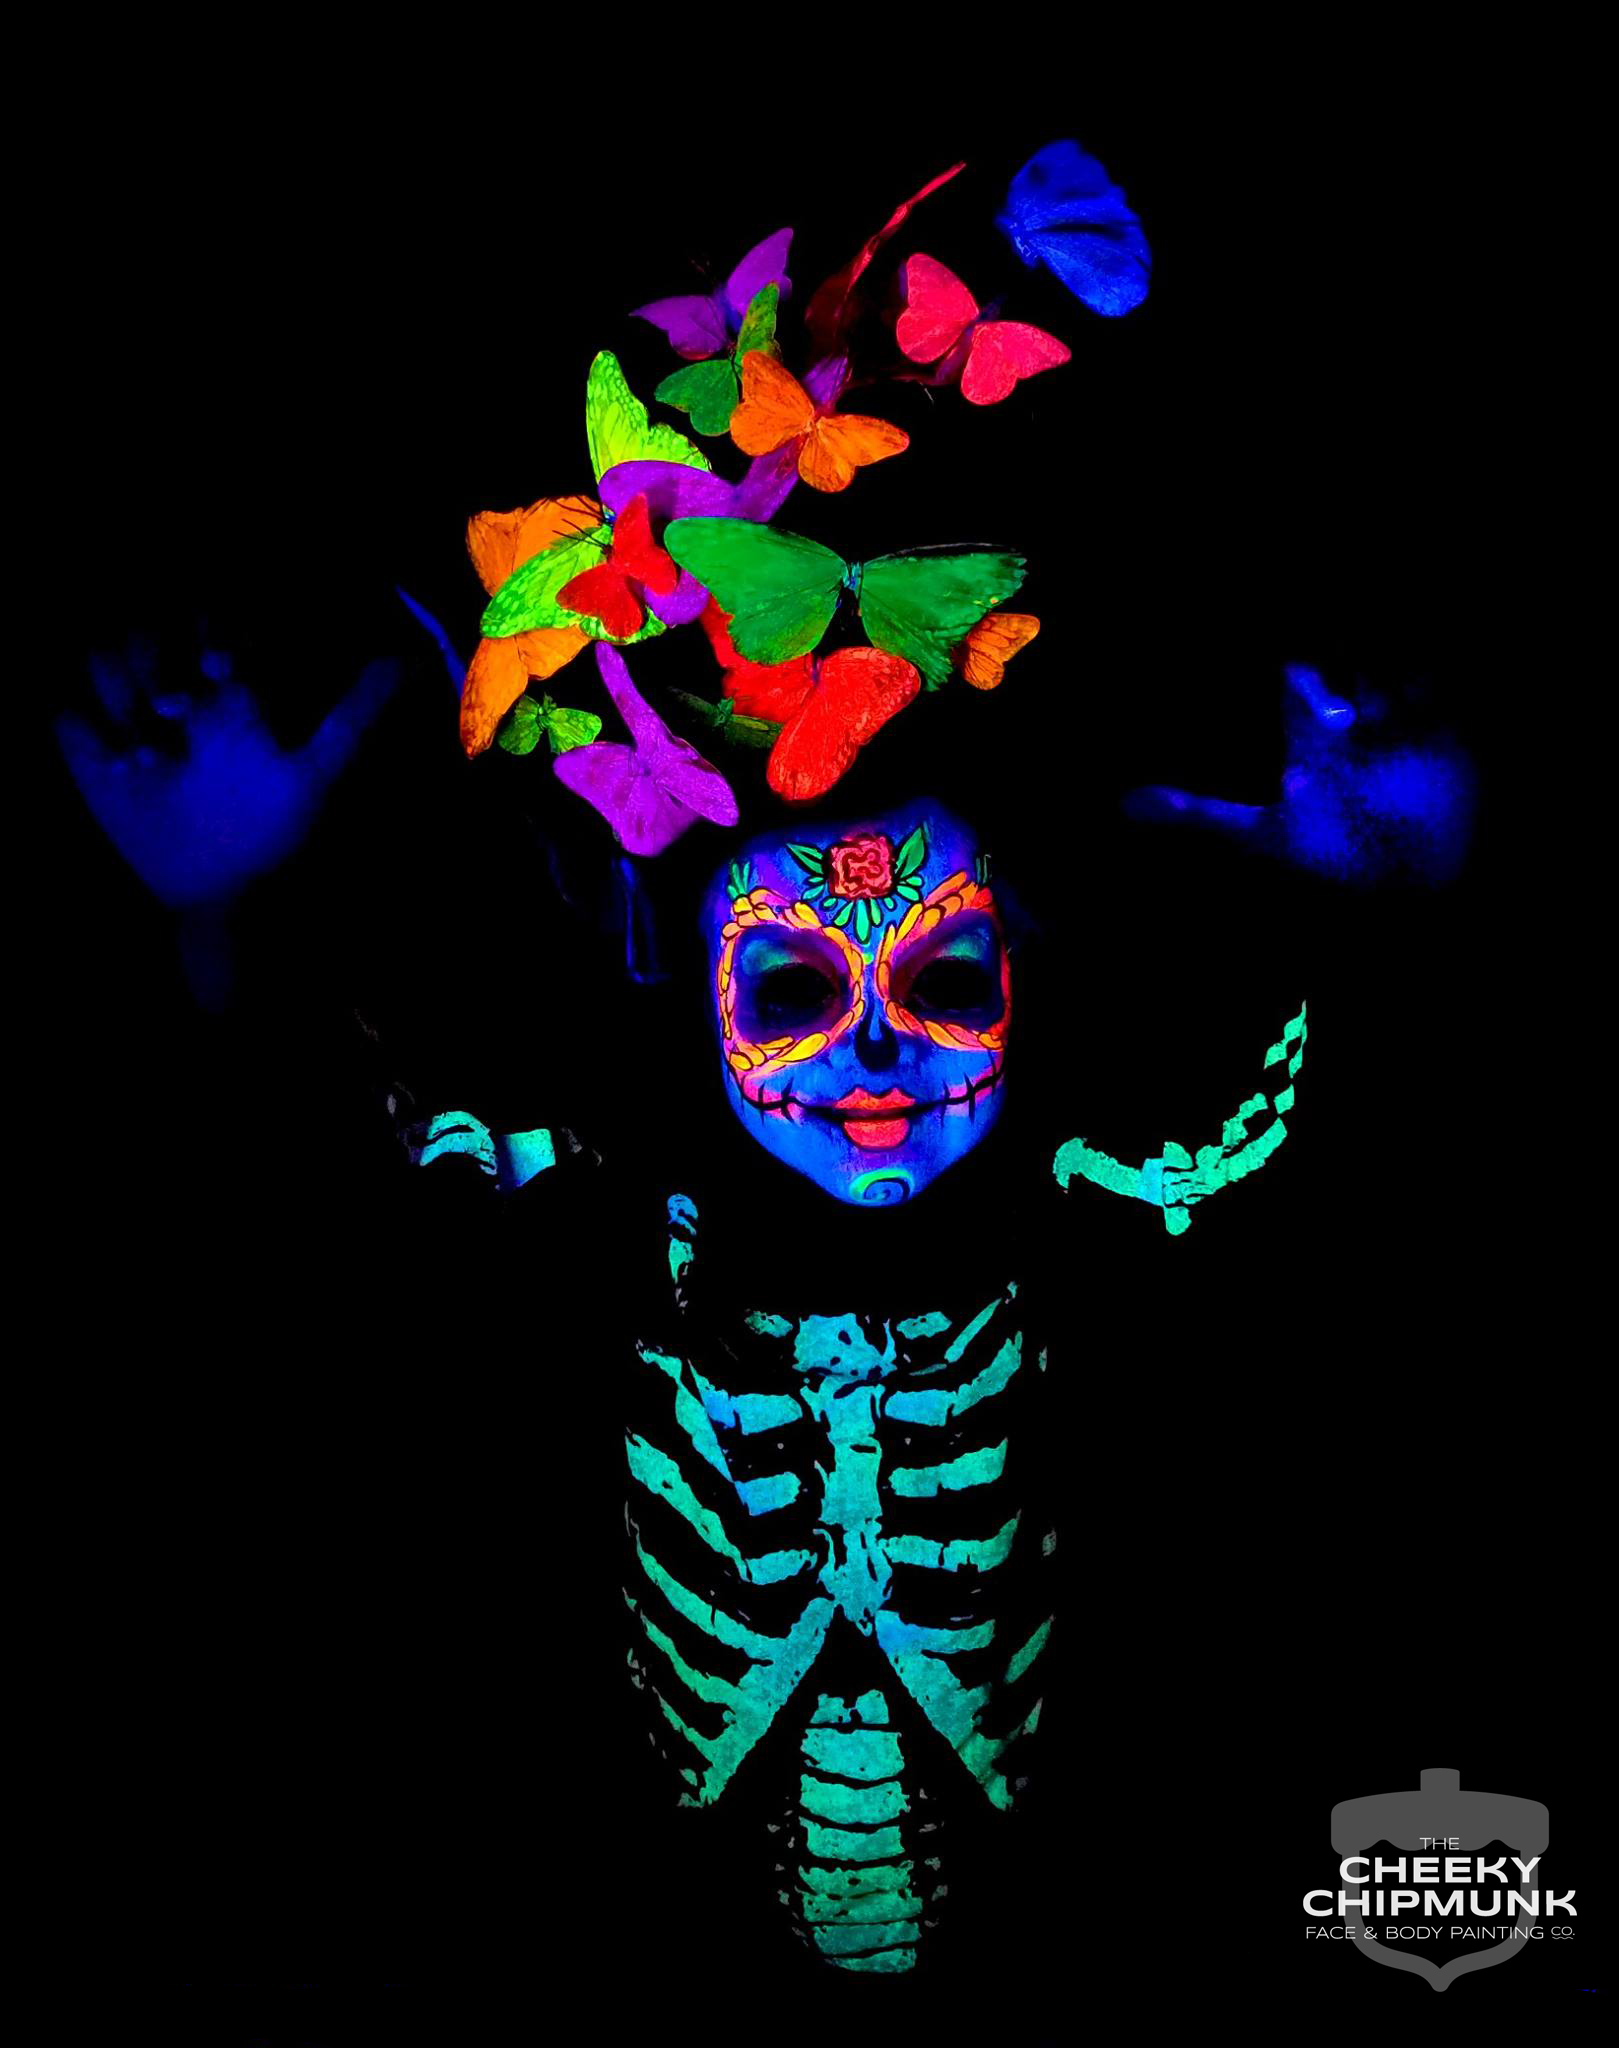 lenore-koppelman-the-cheeky-chipmunk-uv-face-body-painting-skeleton-sugar-skull-calavera-butterflies-headpiece-black-light-blacklight-neon-glow-glowing-little-girl-sophia-nyc.jpg